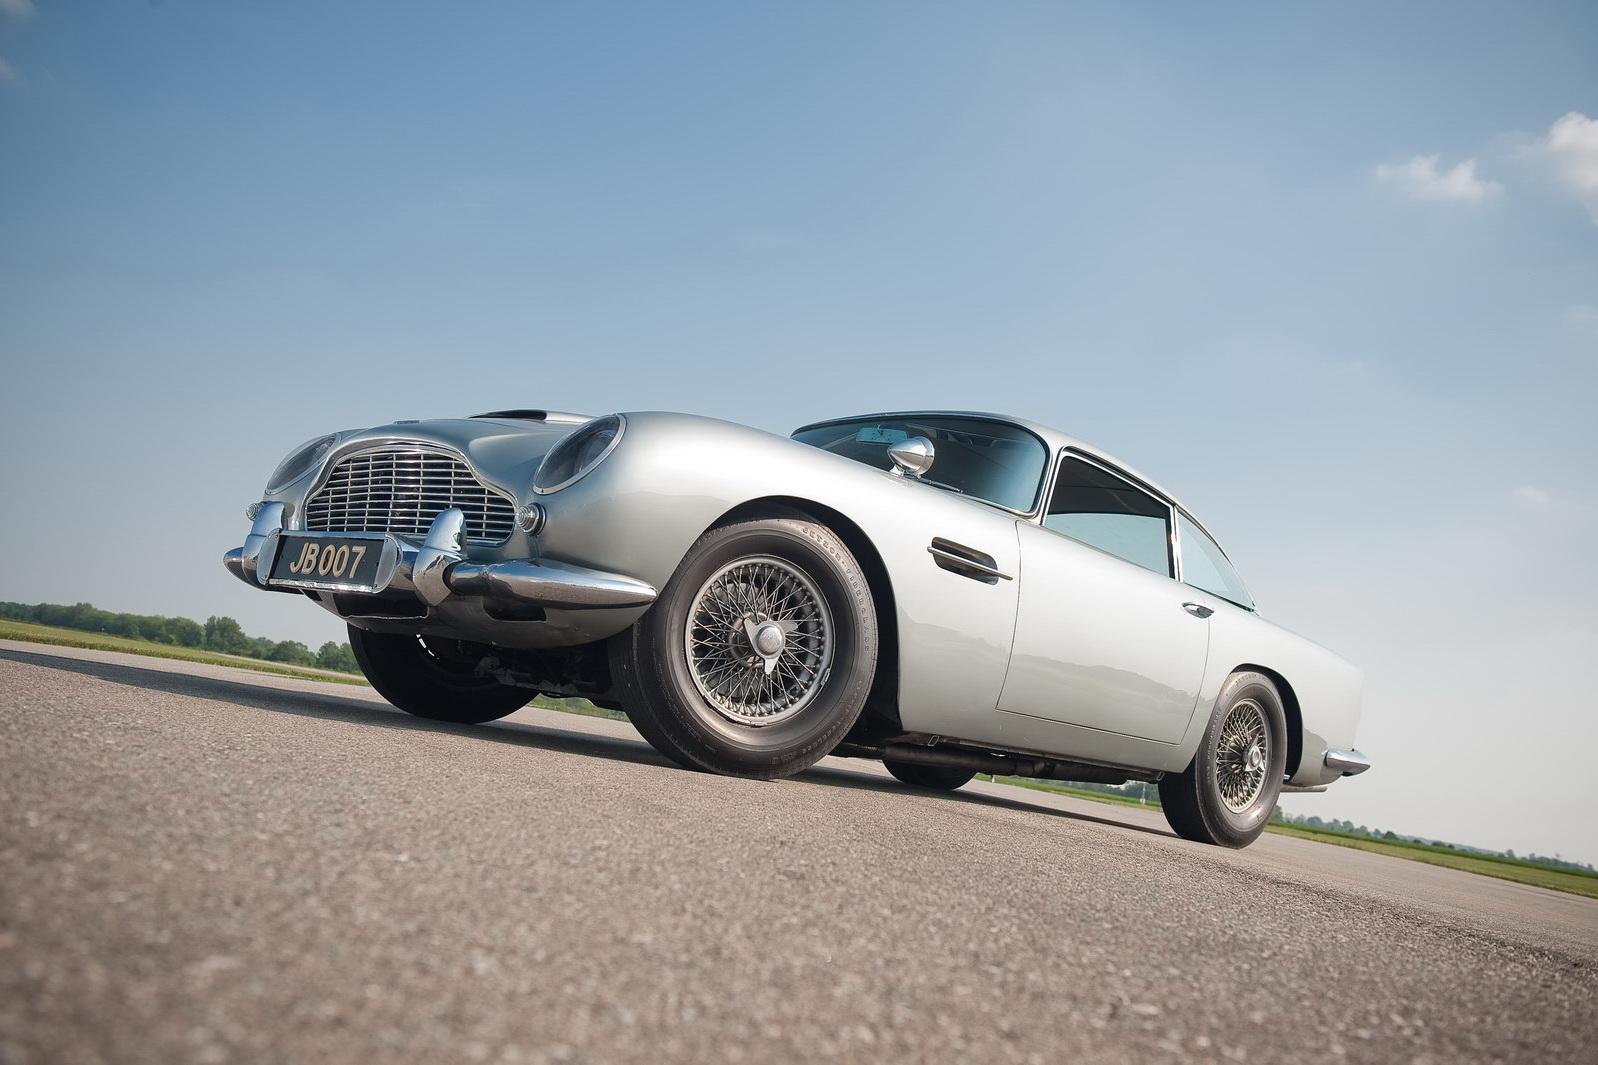 james bond 1964 aston martin db5 109 james bonds original 007 aston. Cars Review. Best American Auto & Cars Review